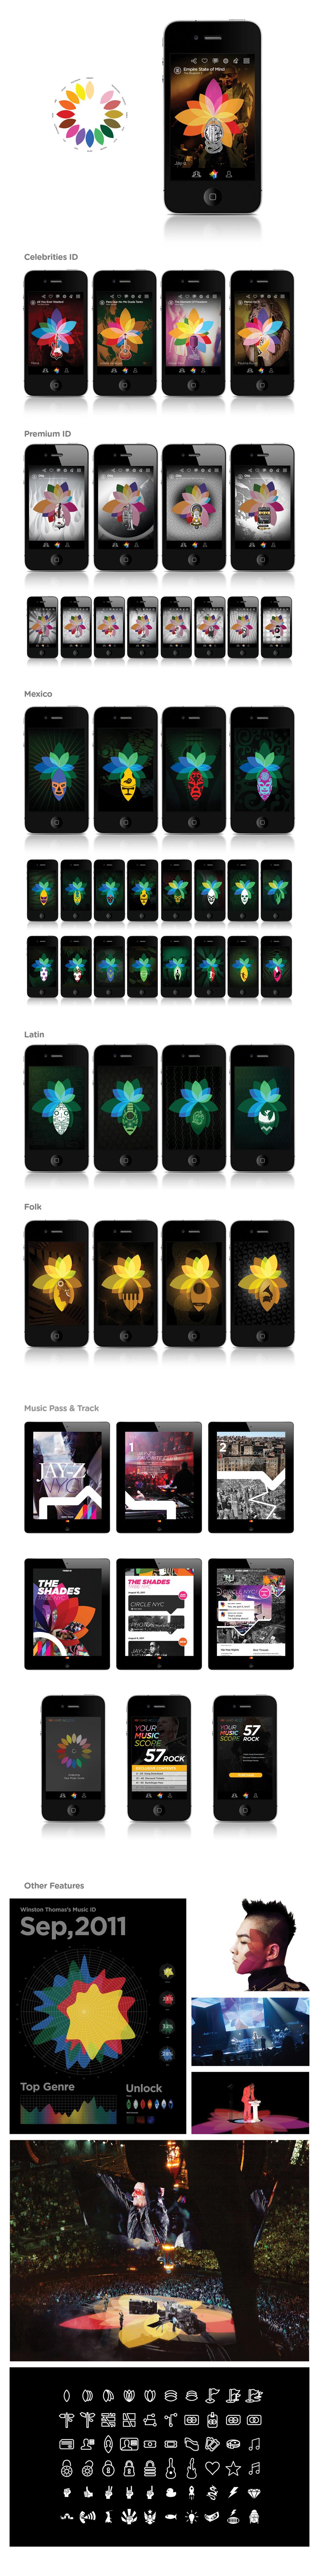 portfolio0203-Mastercard2.jpg